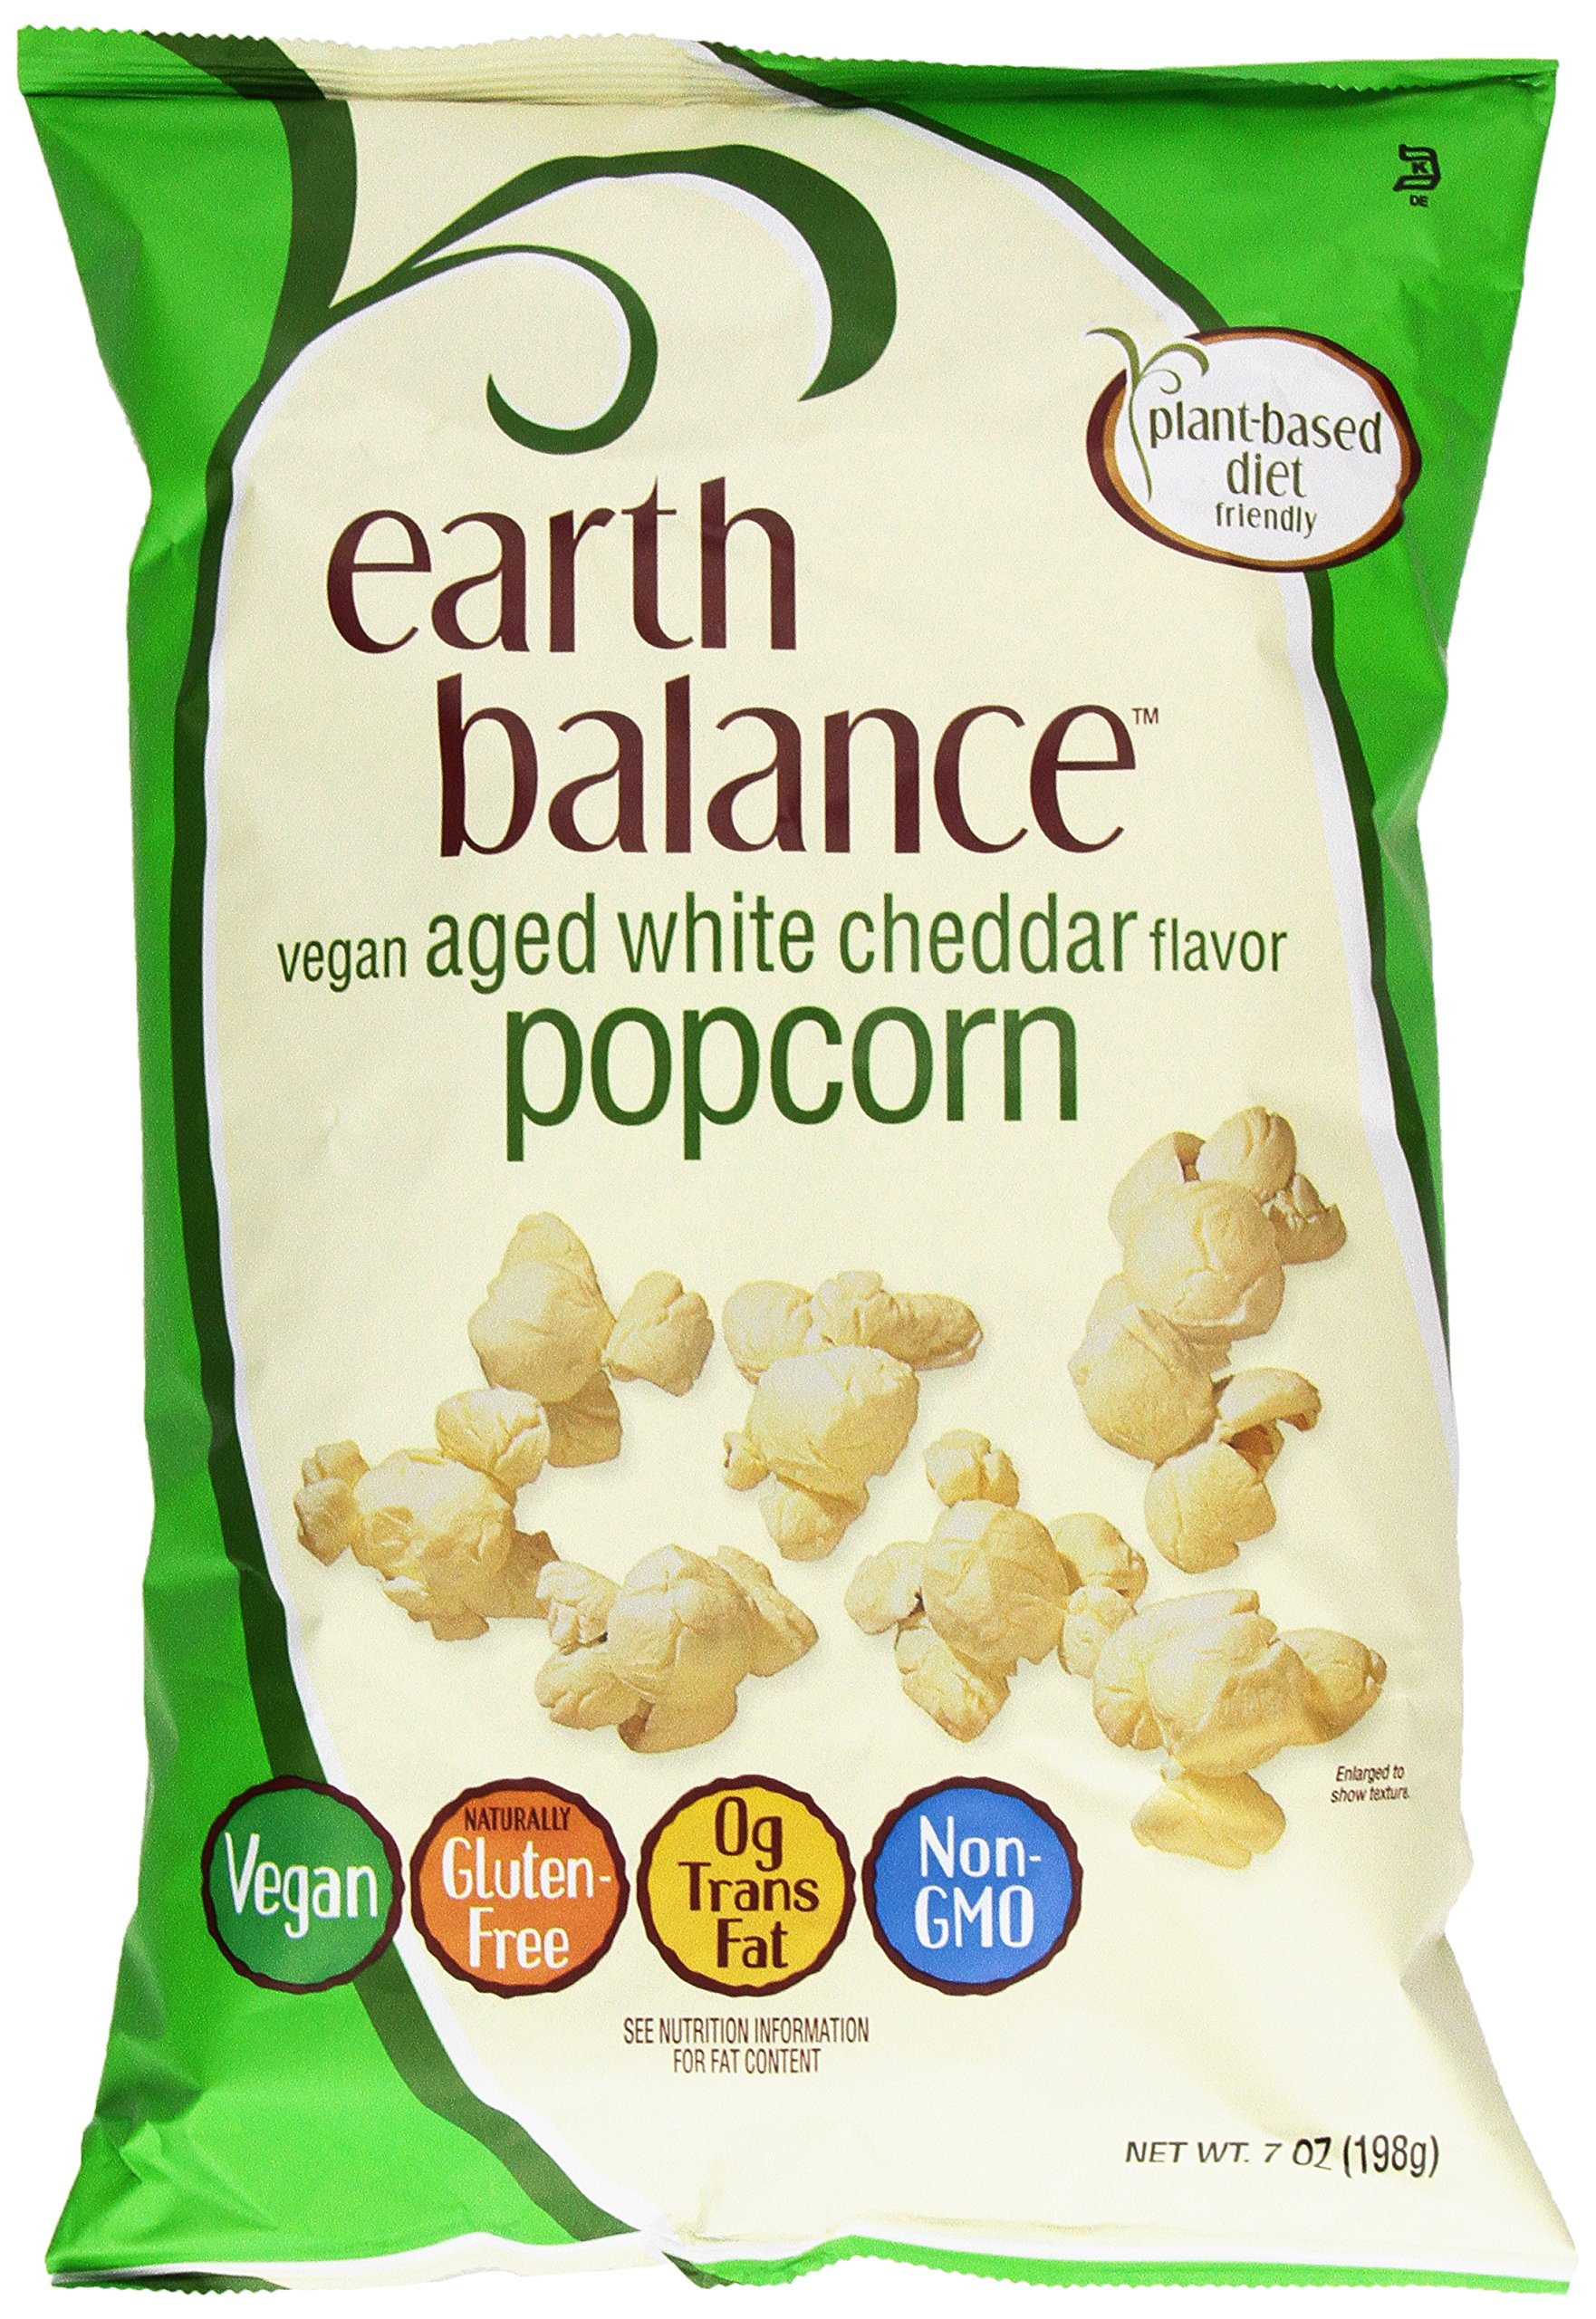 Earth Balance Gluten Free, Vegan Snacks, Aged White Cheddar Flavor Popcorn, 7 Oz